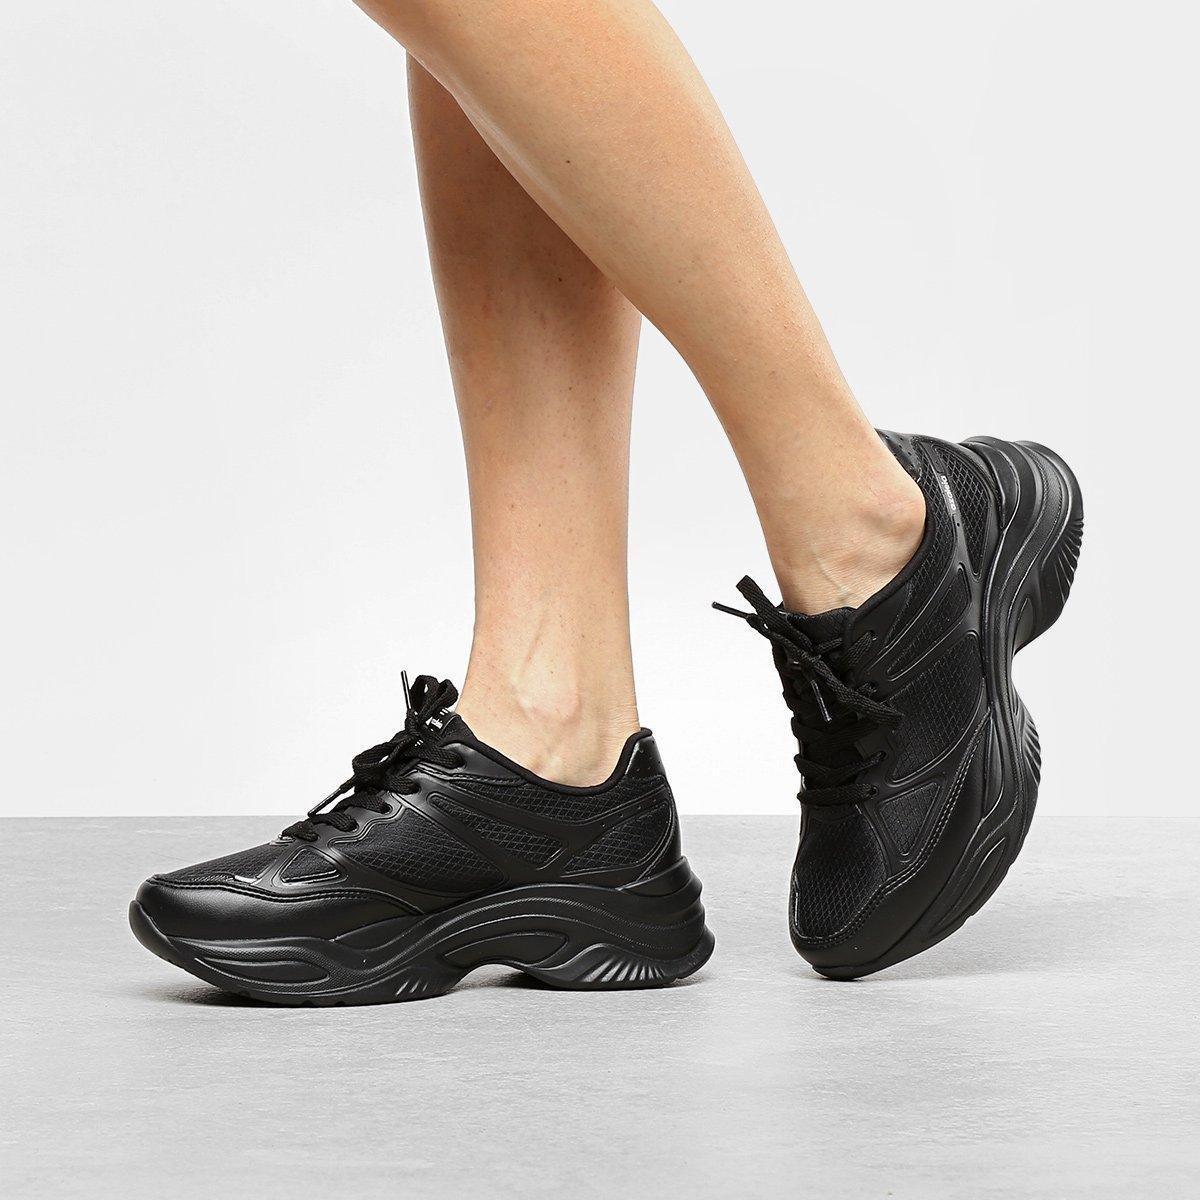 b375d5bc6ca Tênis Azaleia Chunky Sneaker Feminino - Preto e Chumbo - Compre ...